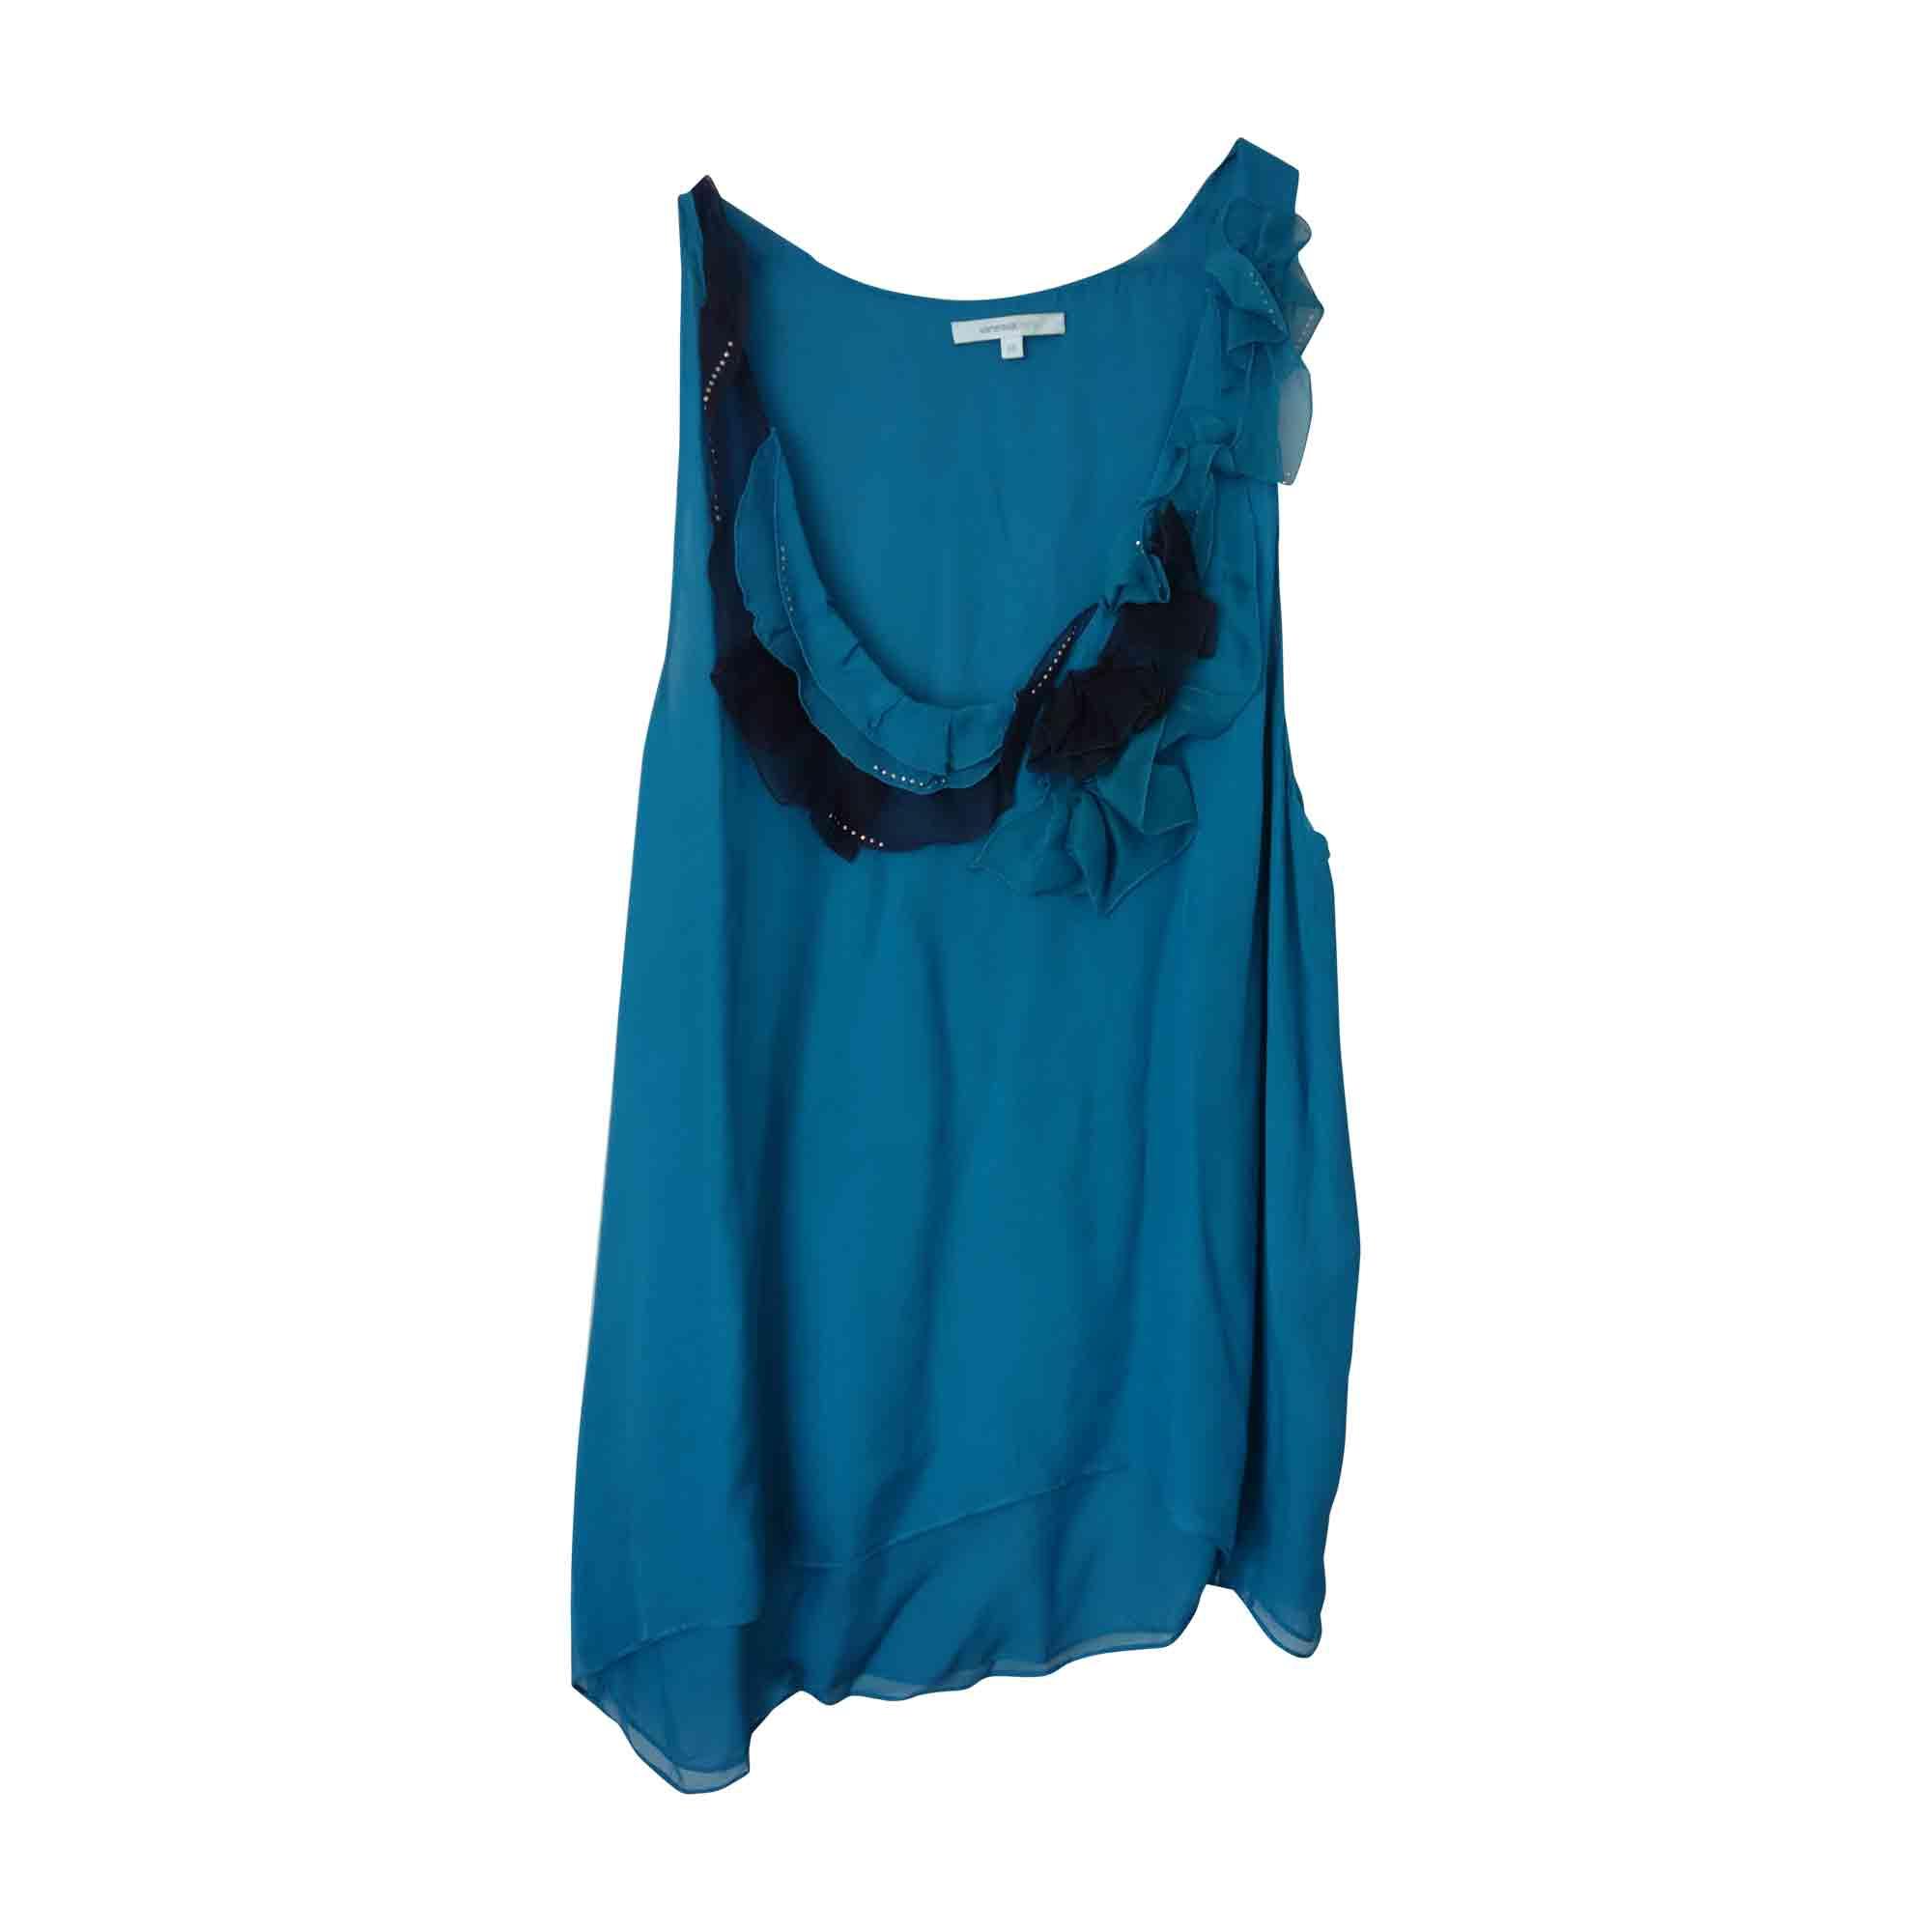 Débardeur VANESSA BRUNO Bleu, bleu marine, bleu turquoise